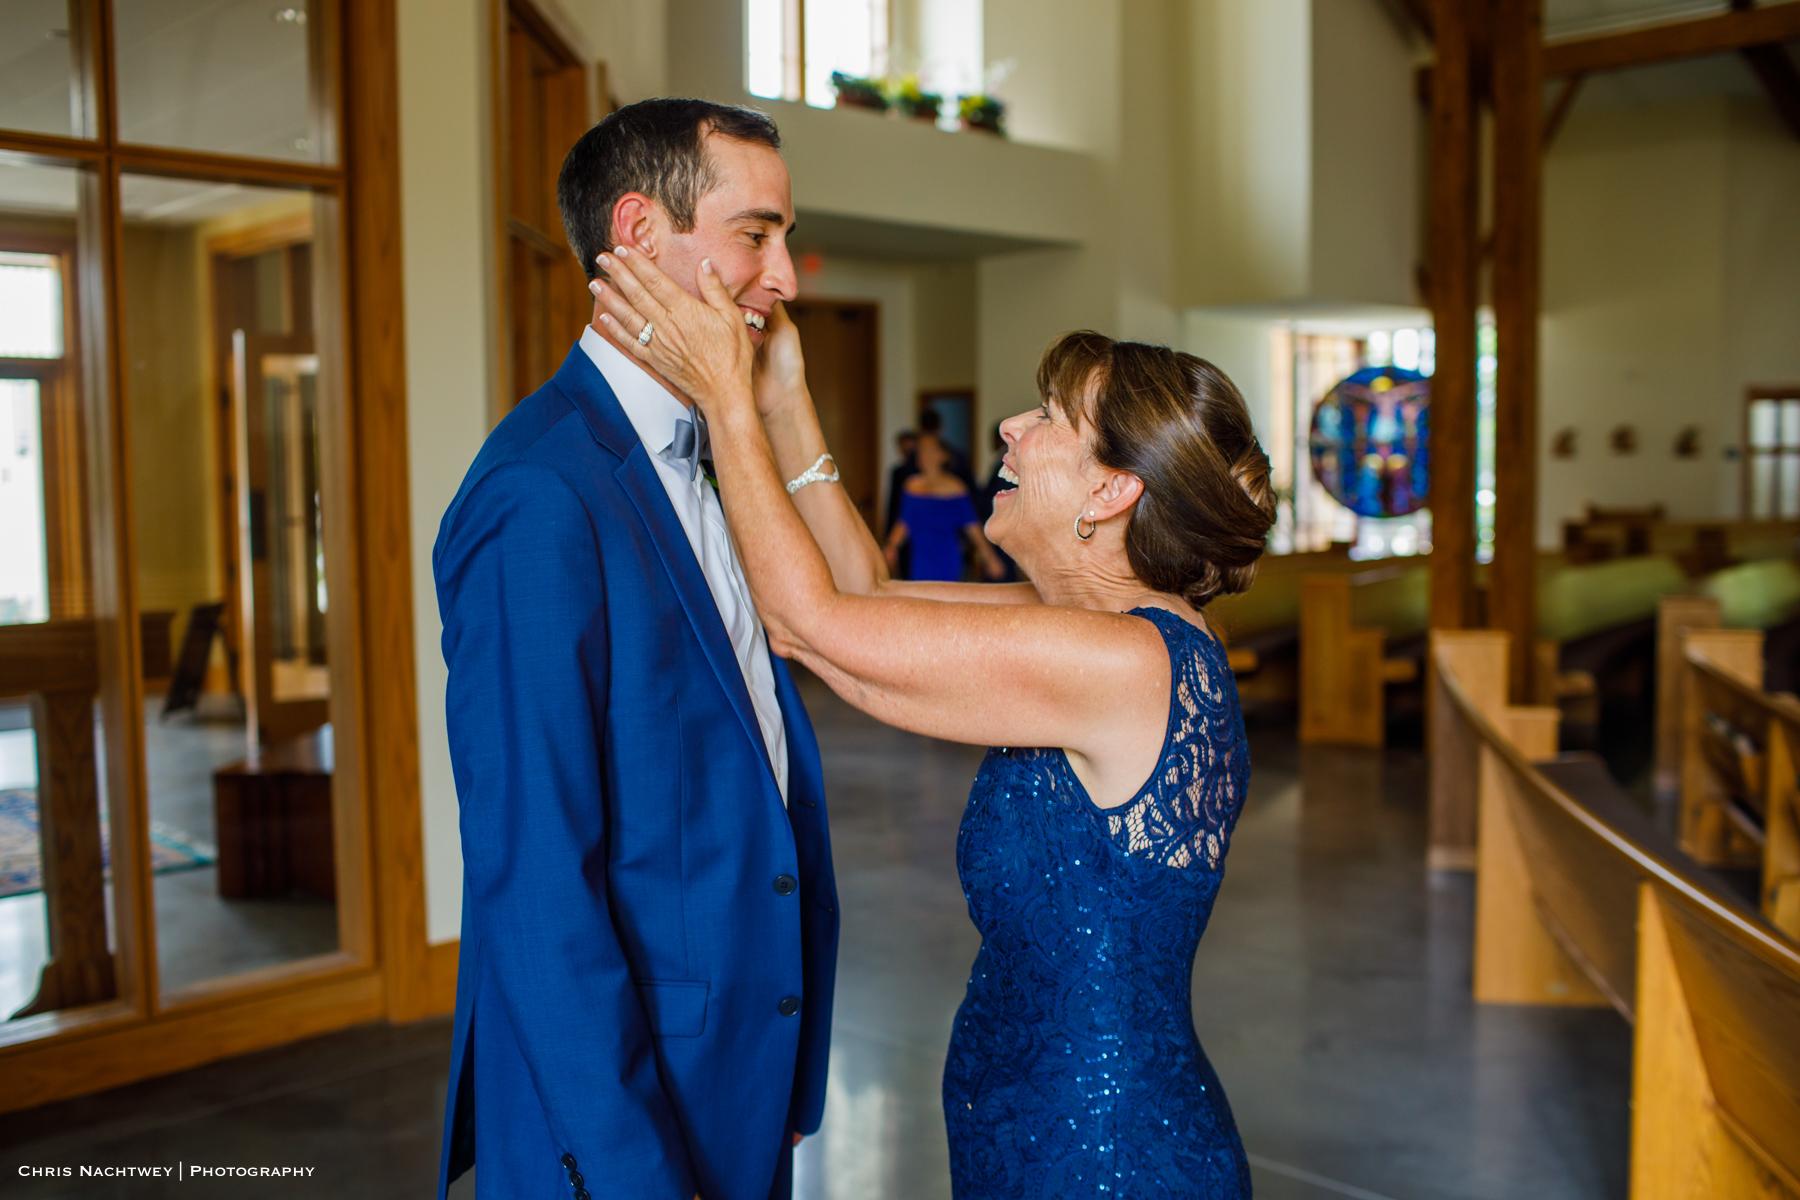 photos-wedding-quidnessett-country-club-ri-chris-nachtwey-photography-2018-15.jpg